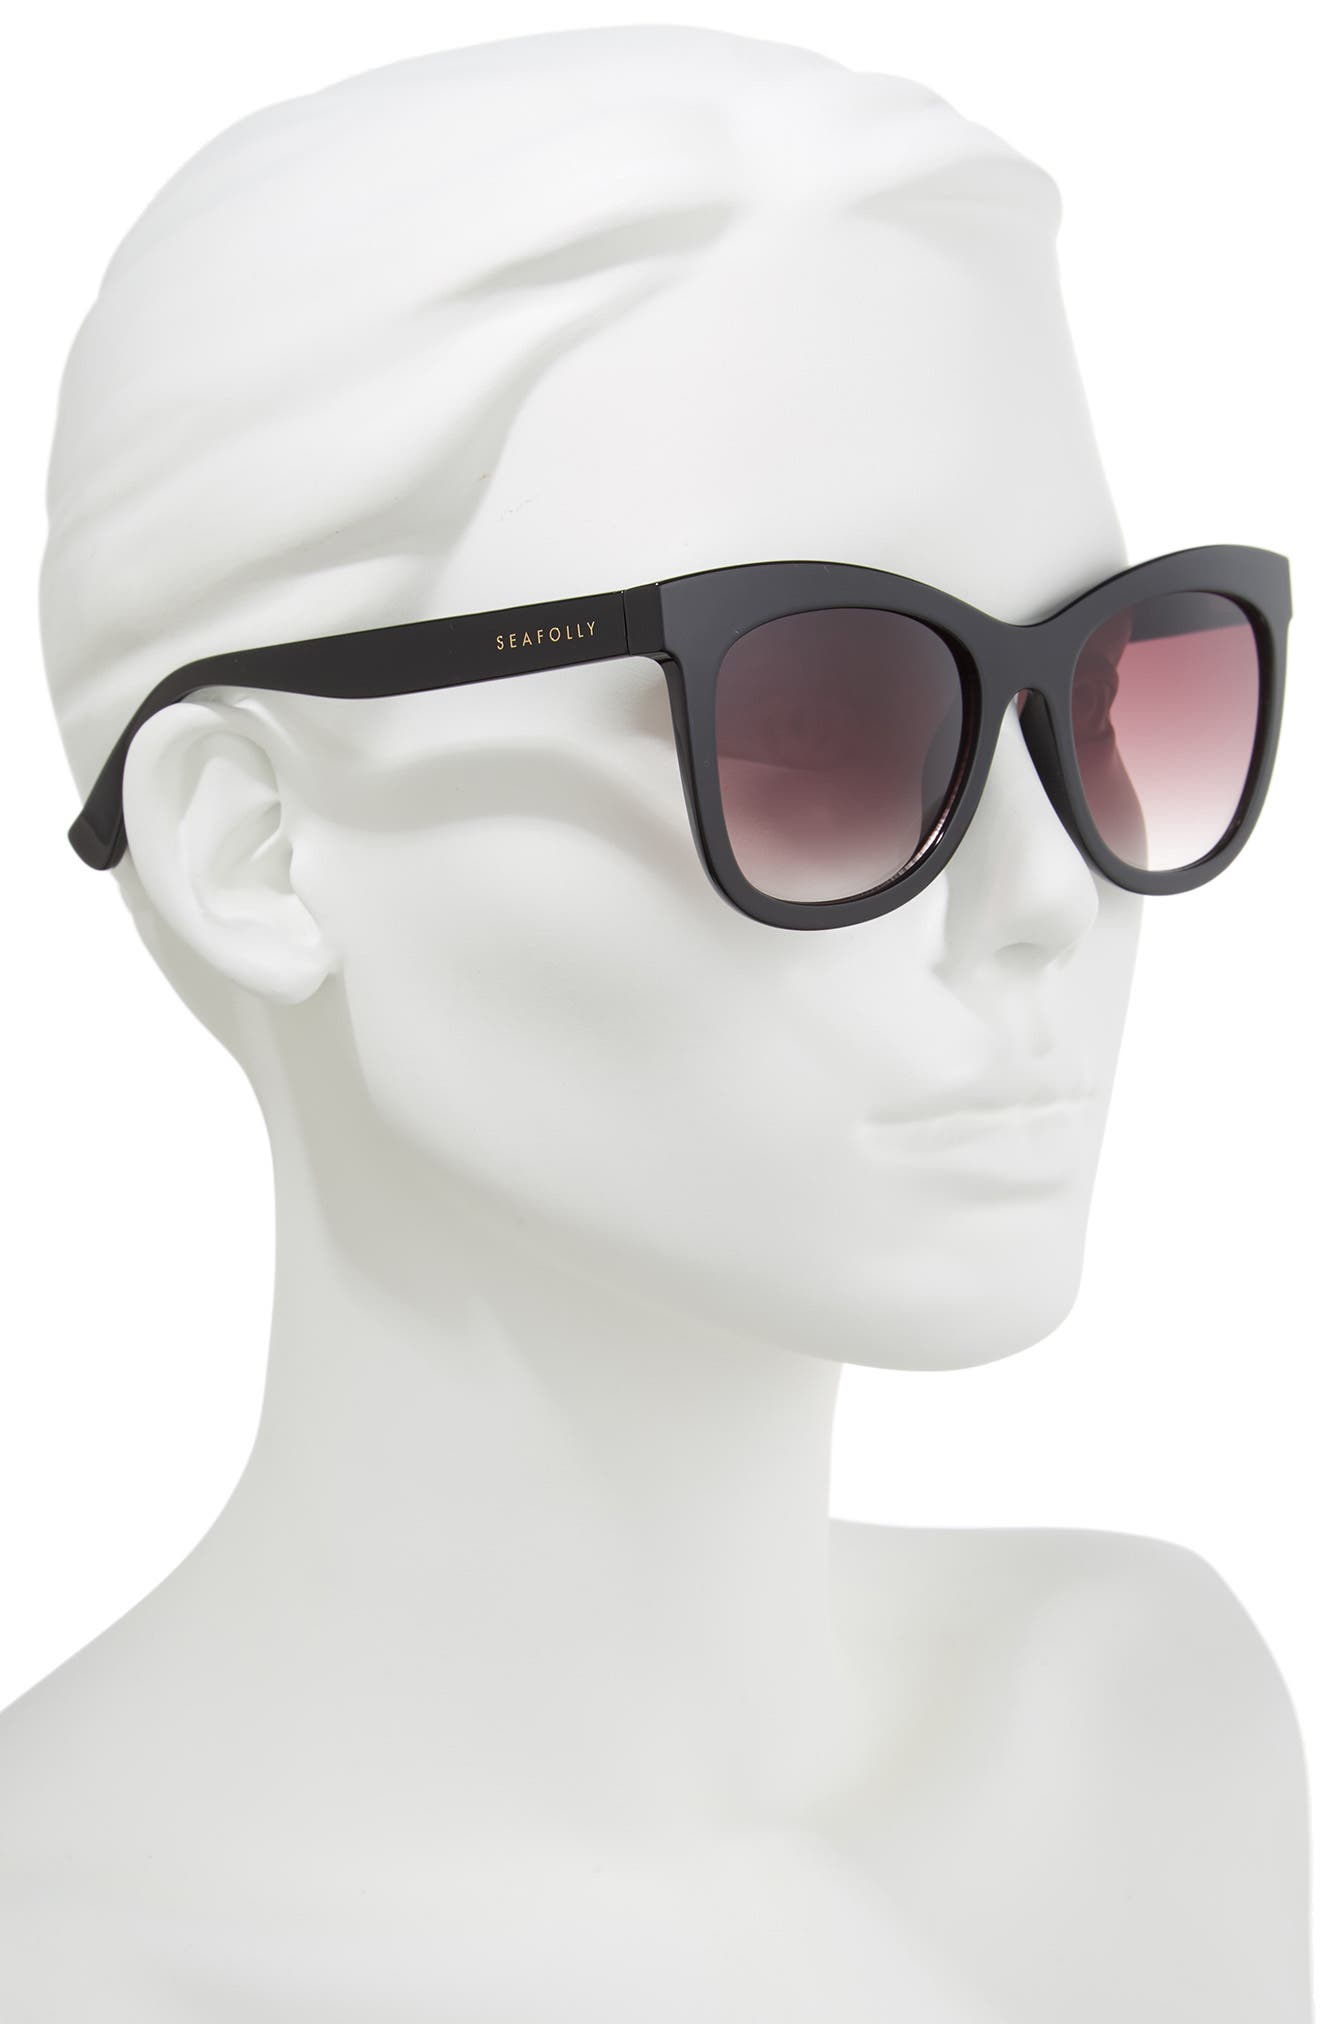 Manly 52mm Cat Eye Sunglasses,                             Alternate thumbnail 2, color,                             BLACK